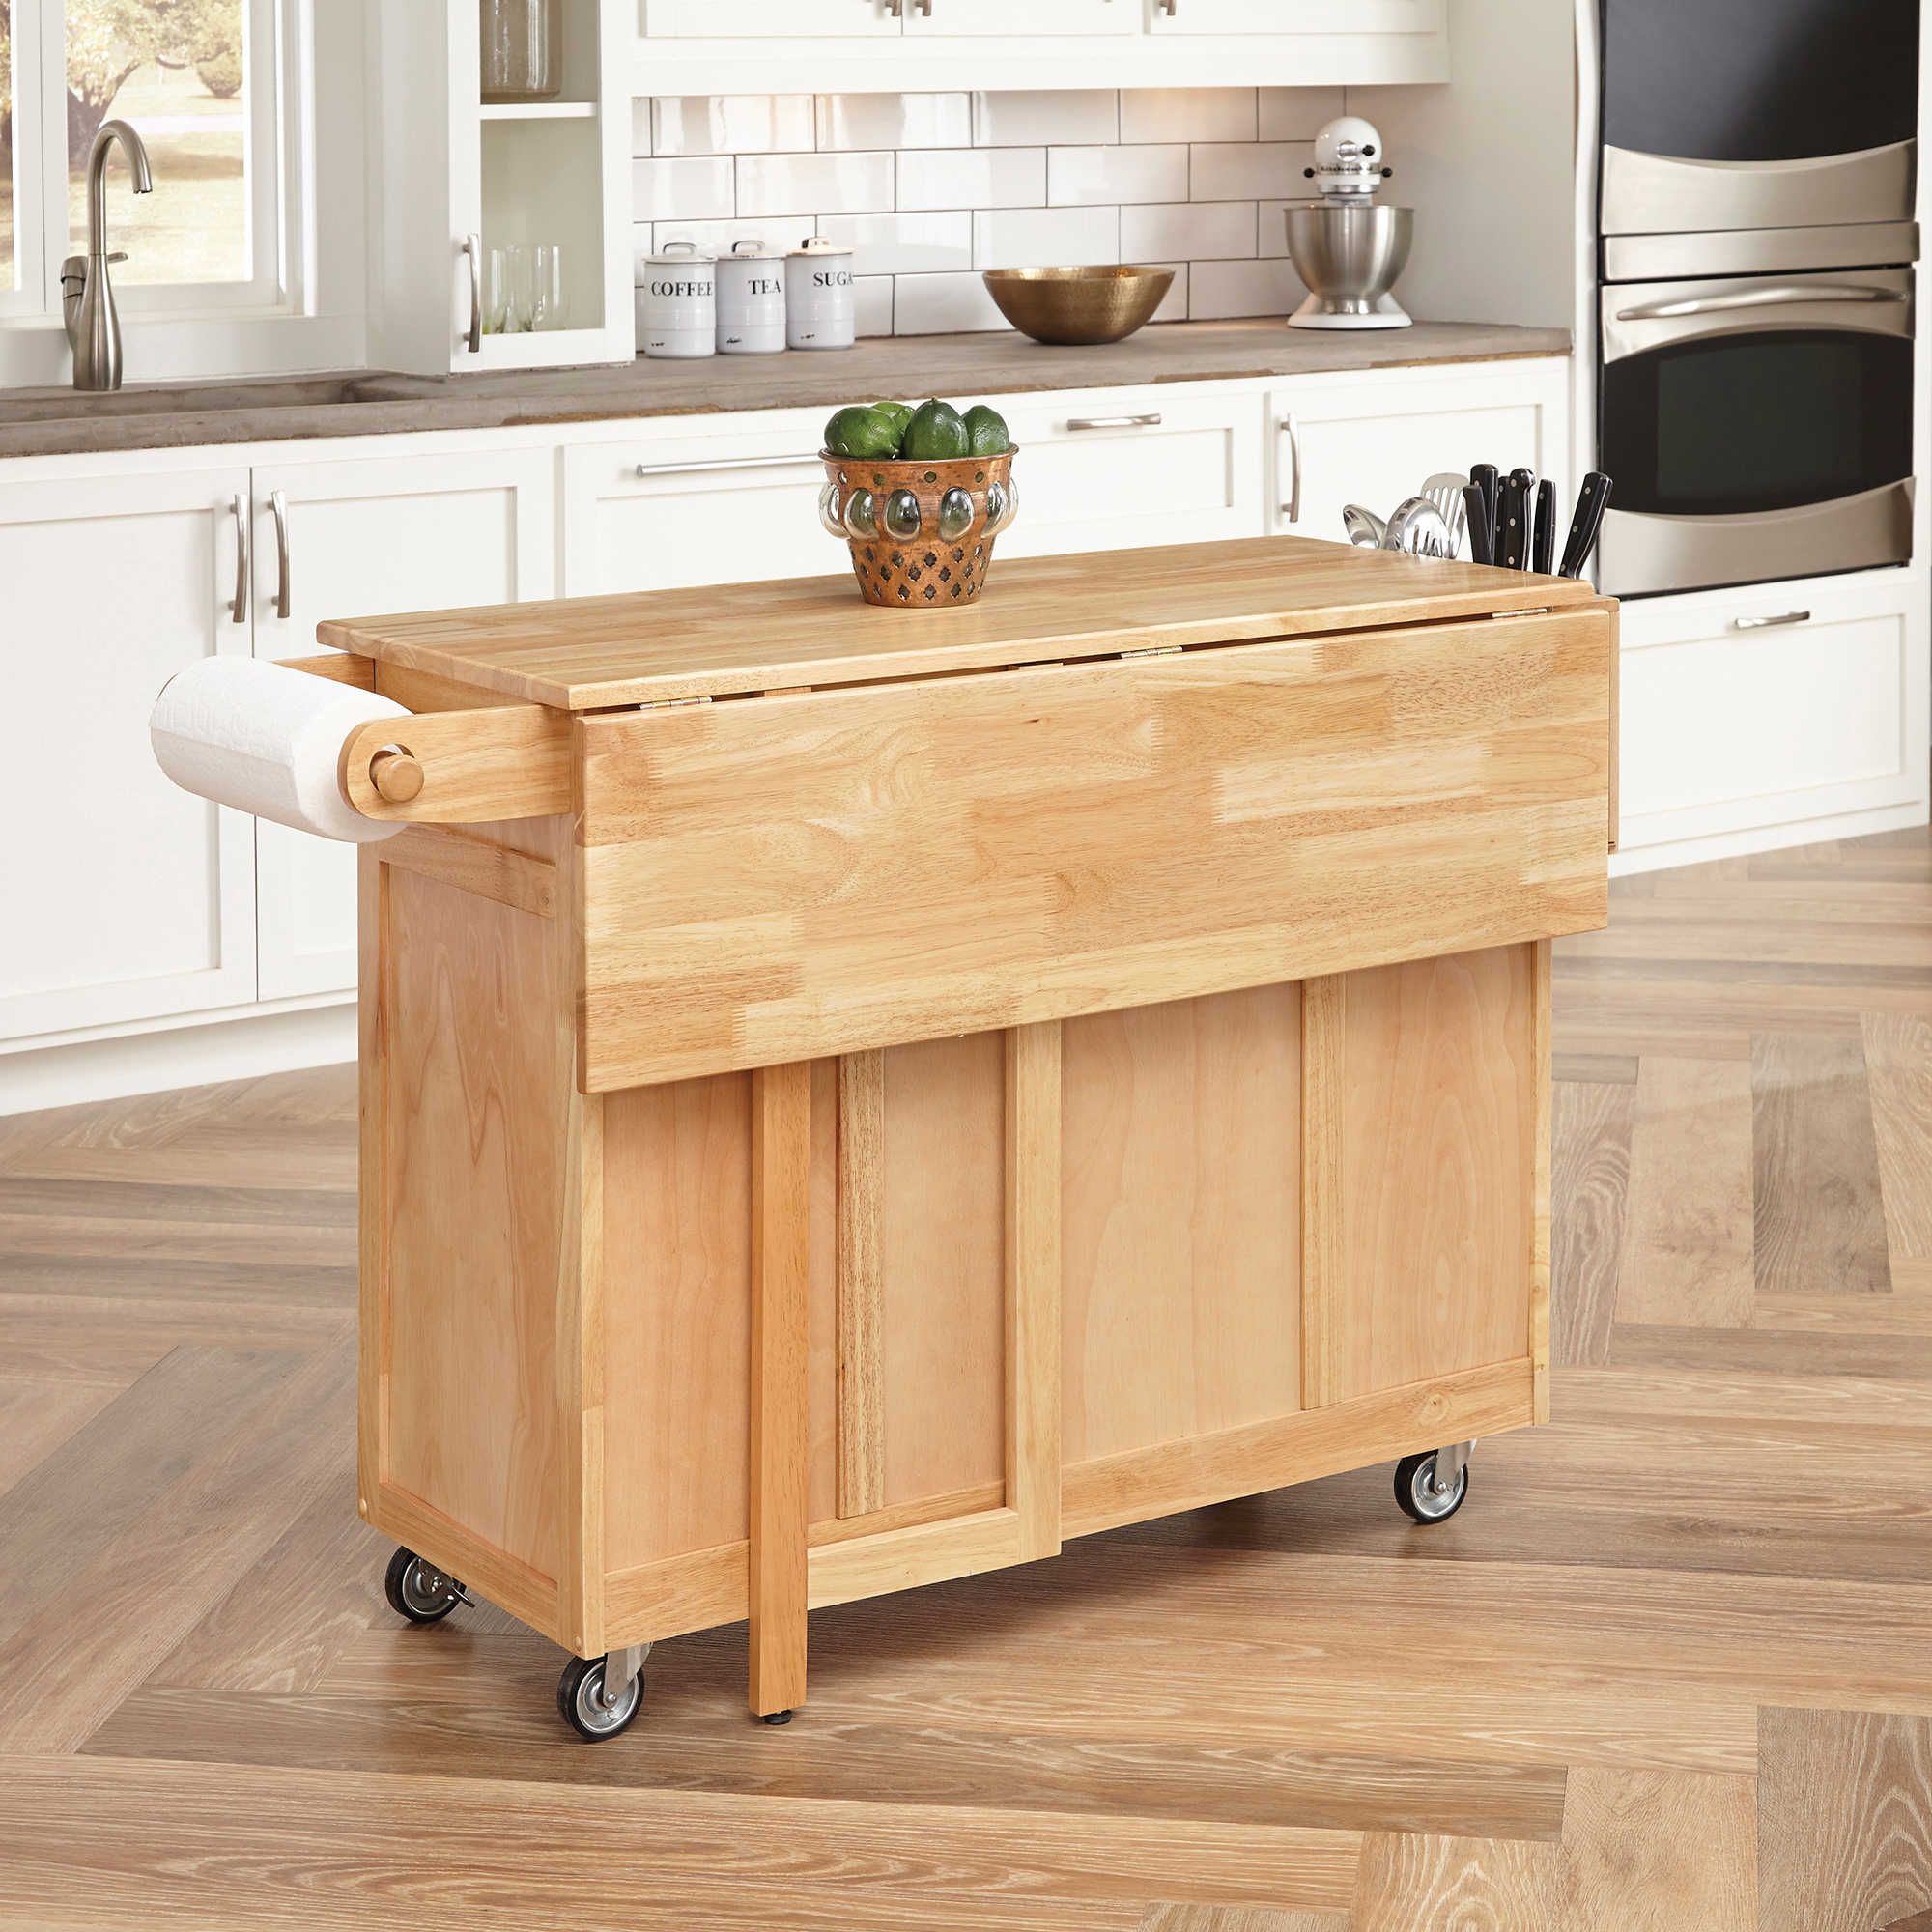 home styles wood top kitchen cart | kitchen ideas | pinterest